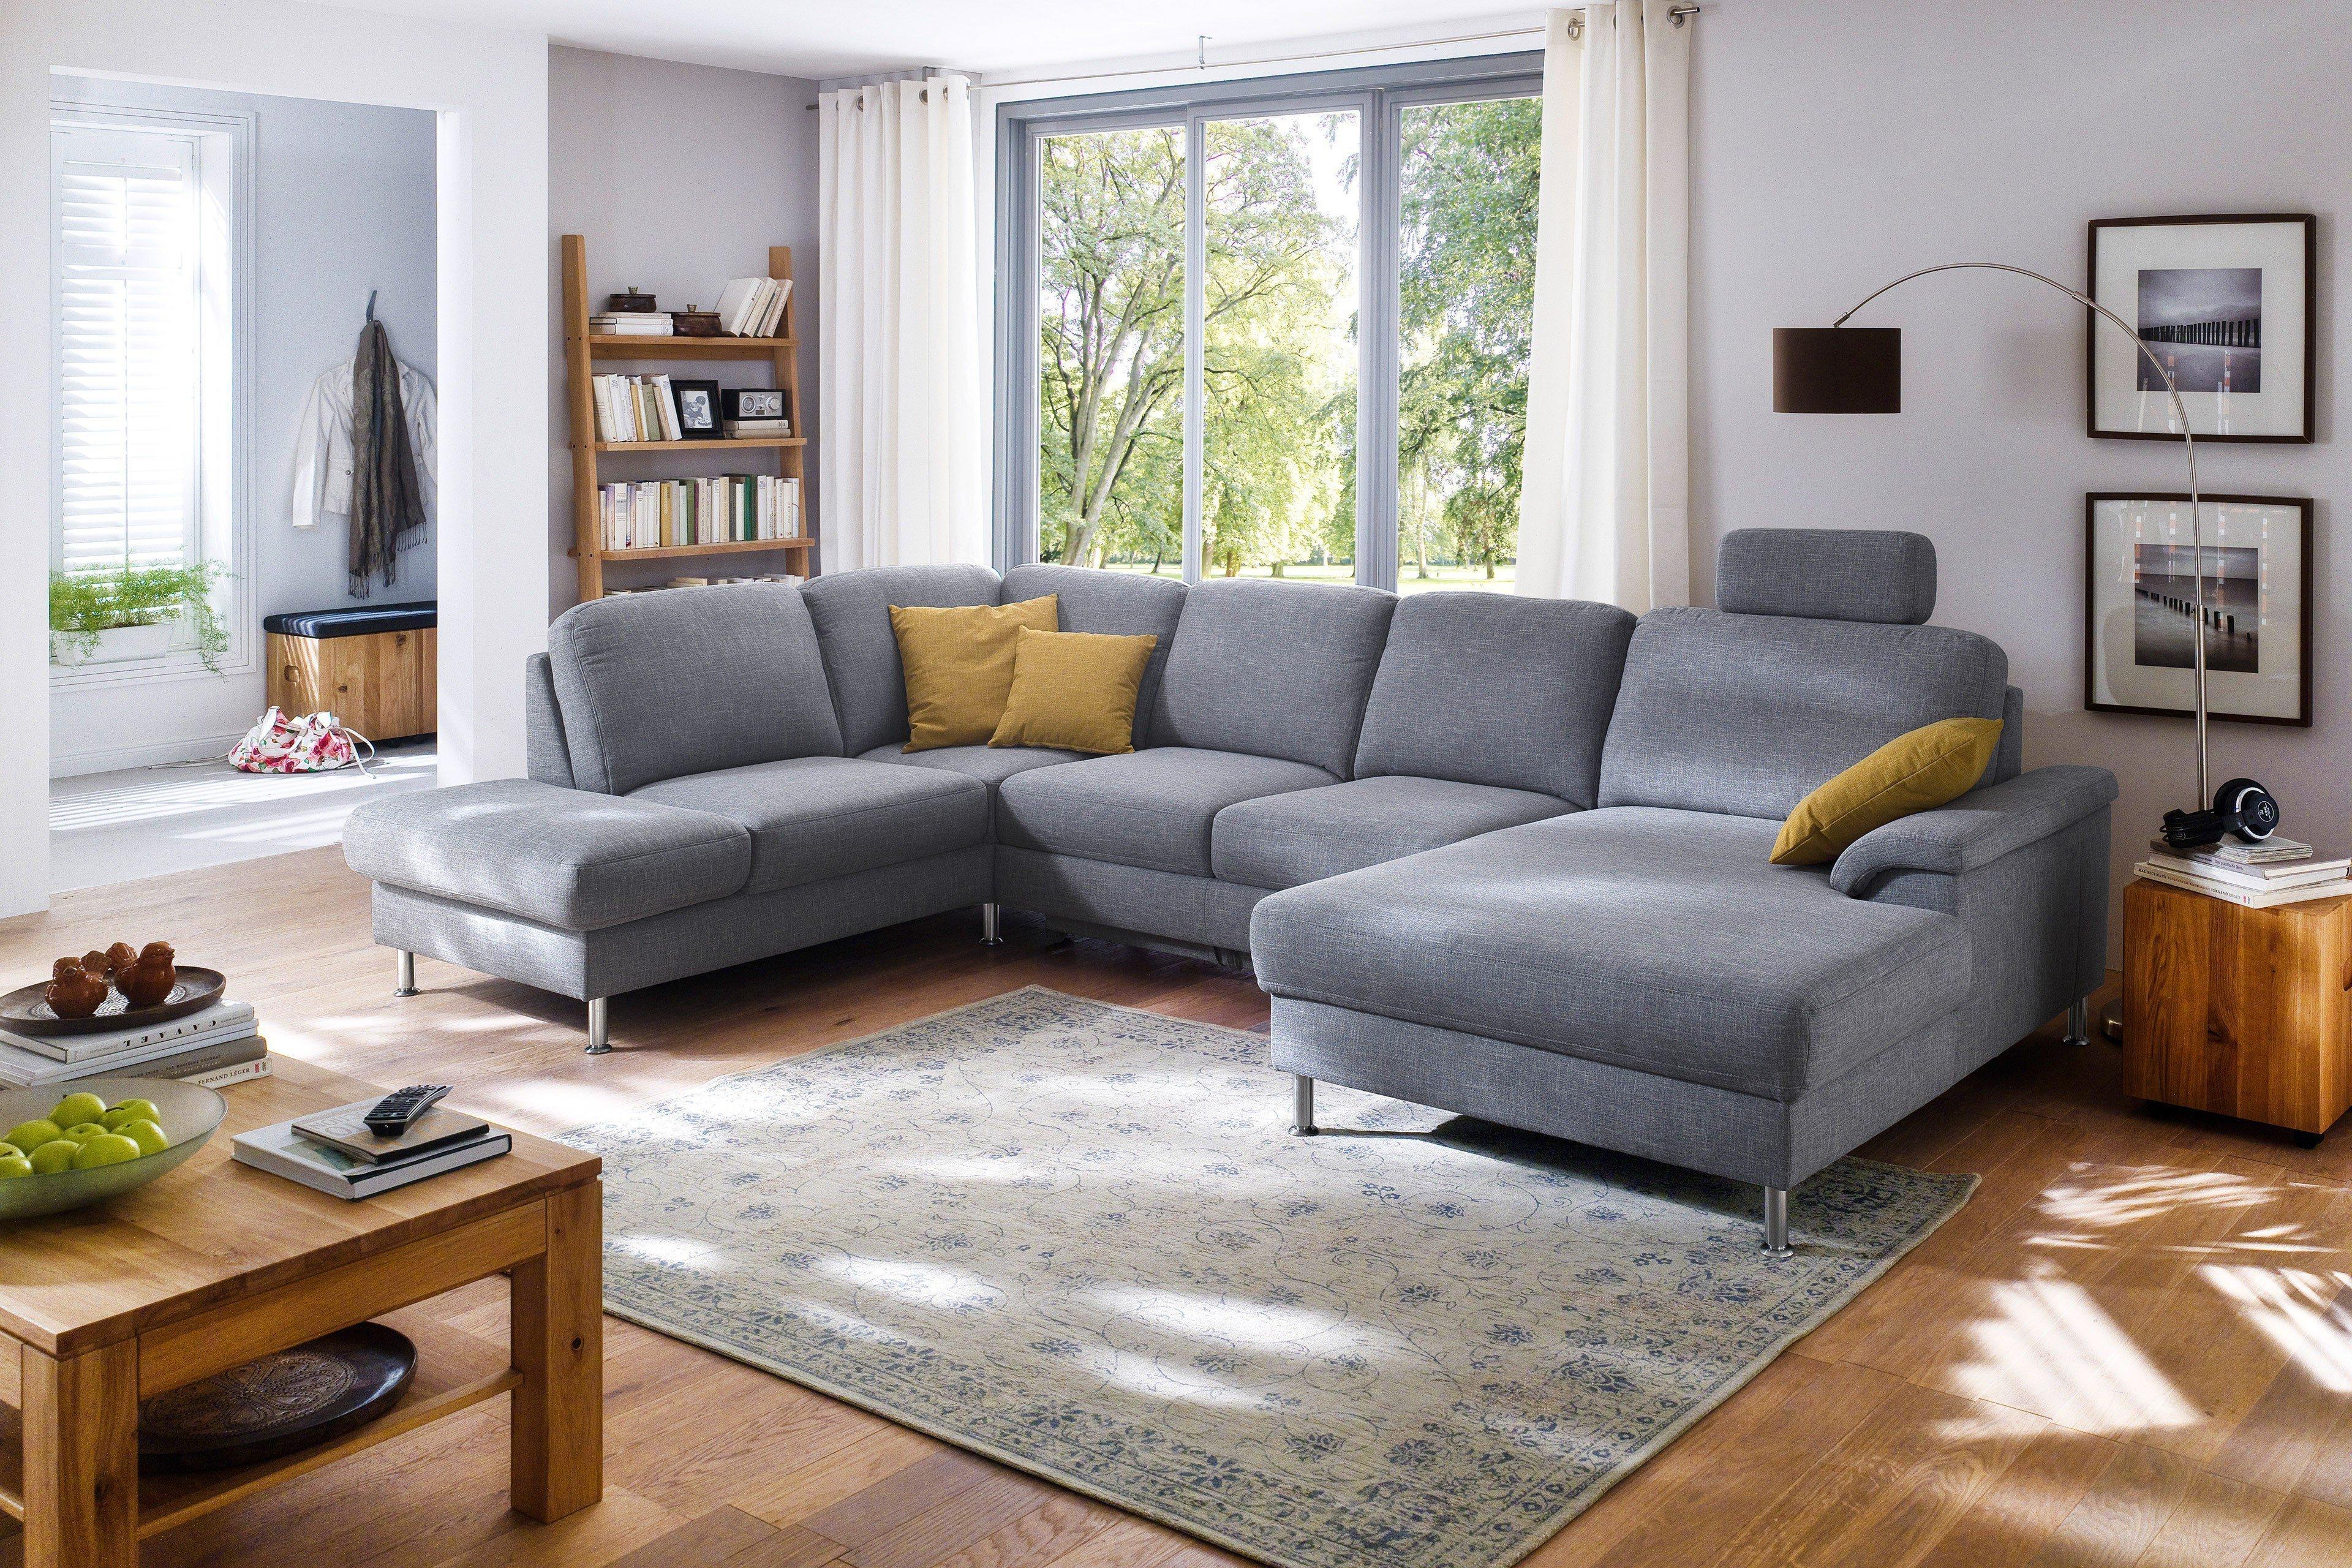 Carina Polsterm Bel U Sofa Bella In Grau M Bel Letz Ihr Online Shop